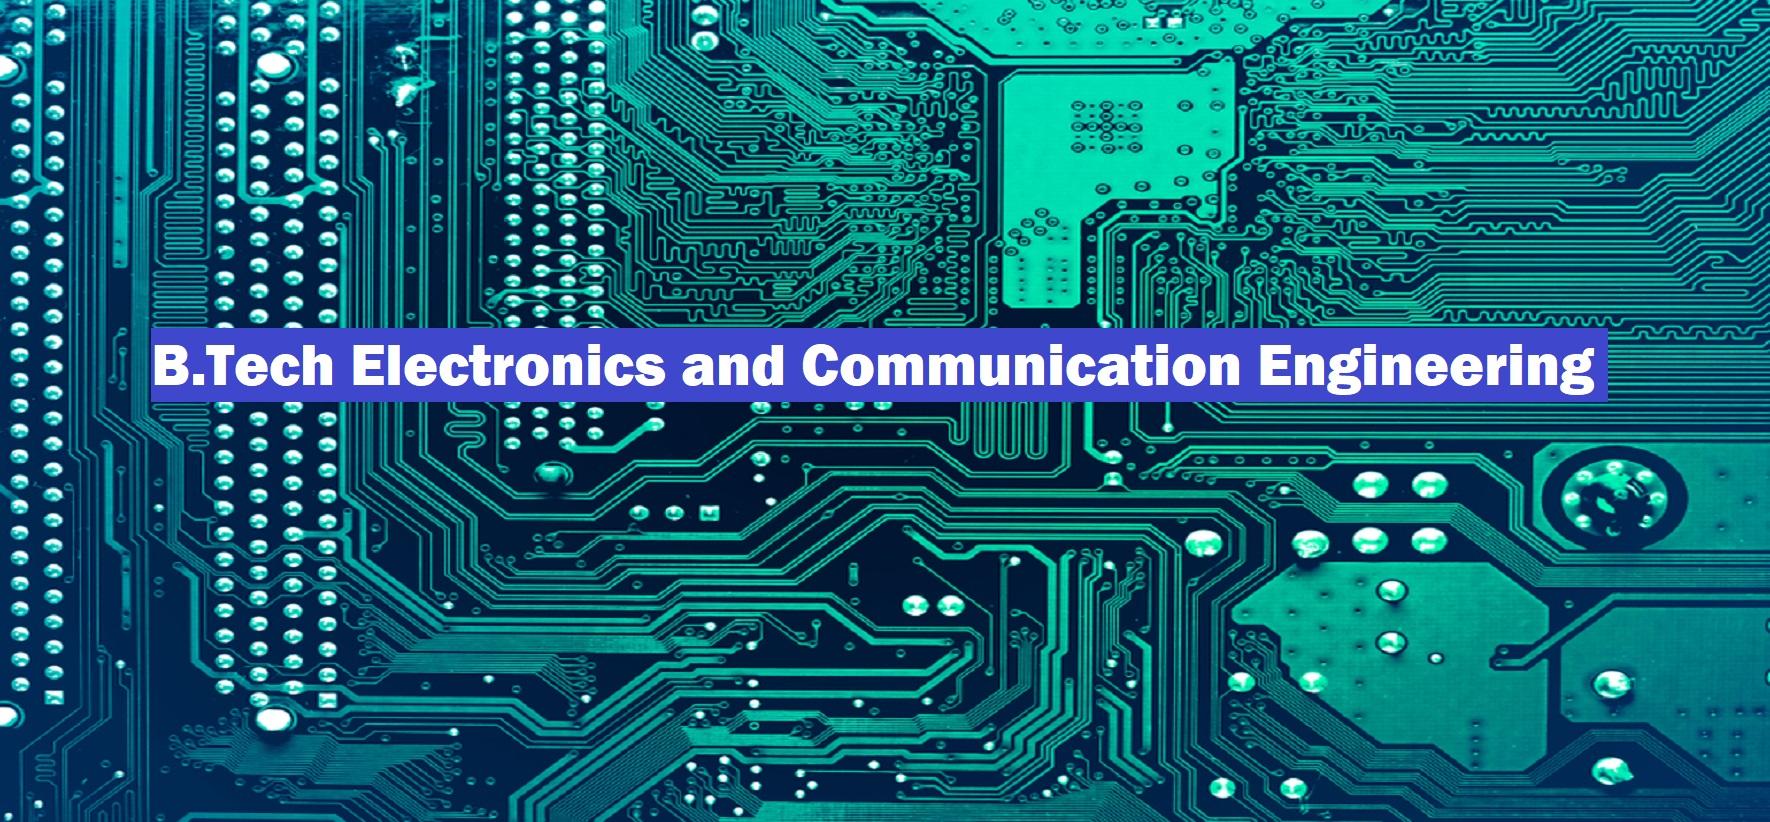 B.Tech Electronics & Communication Engineering